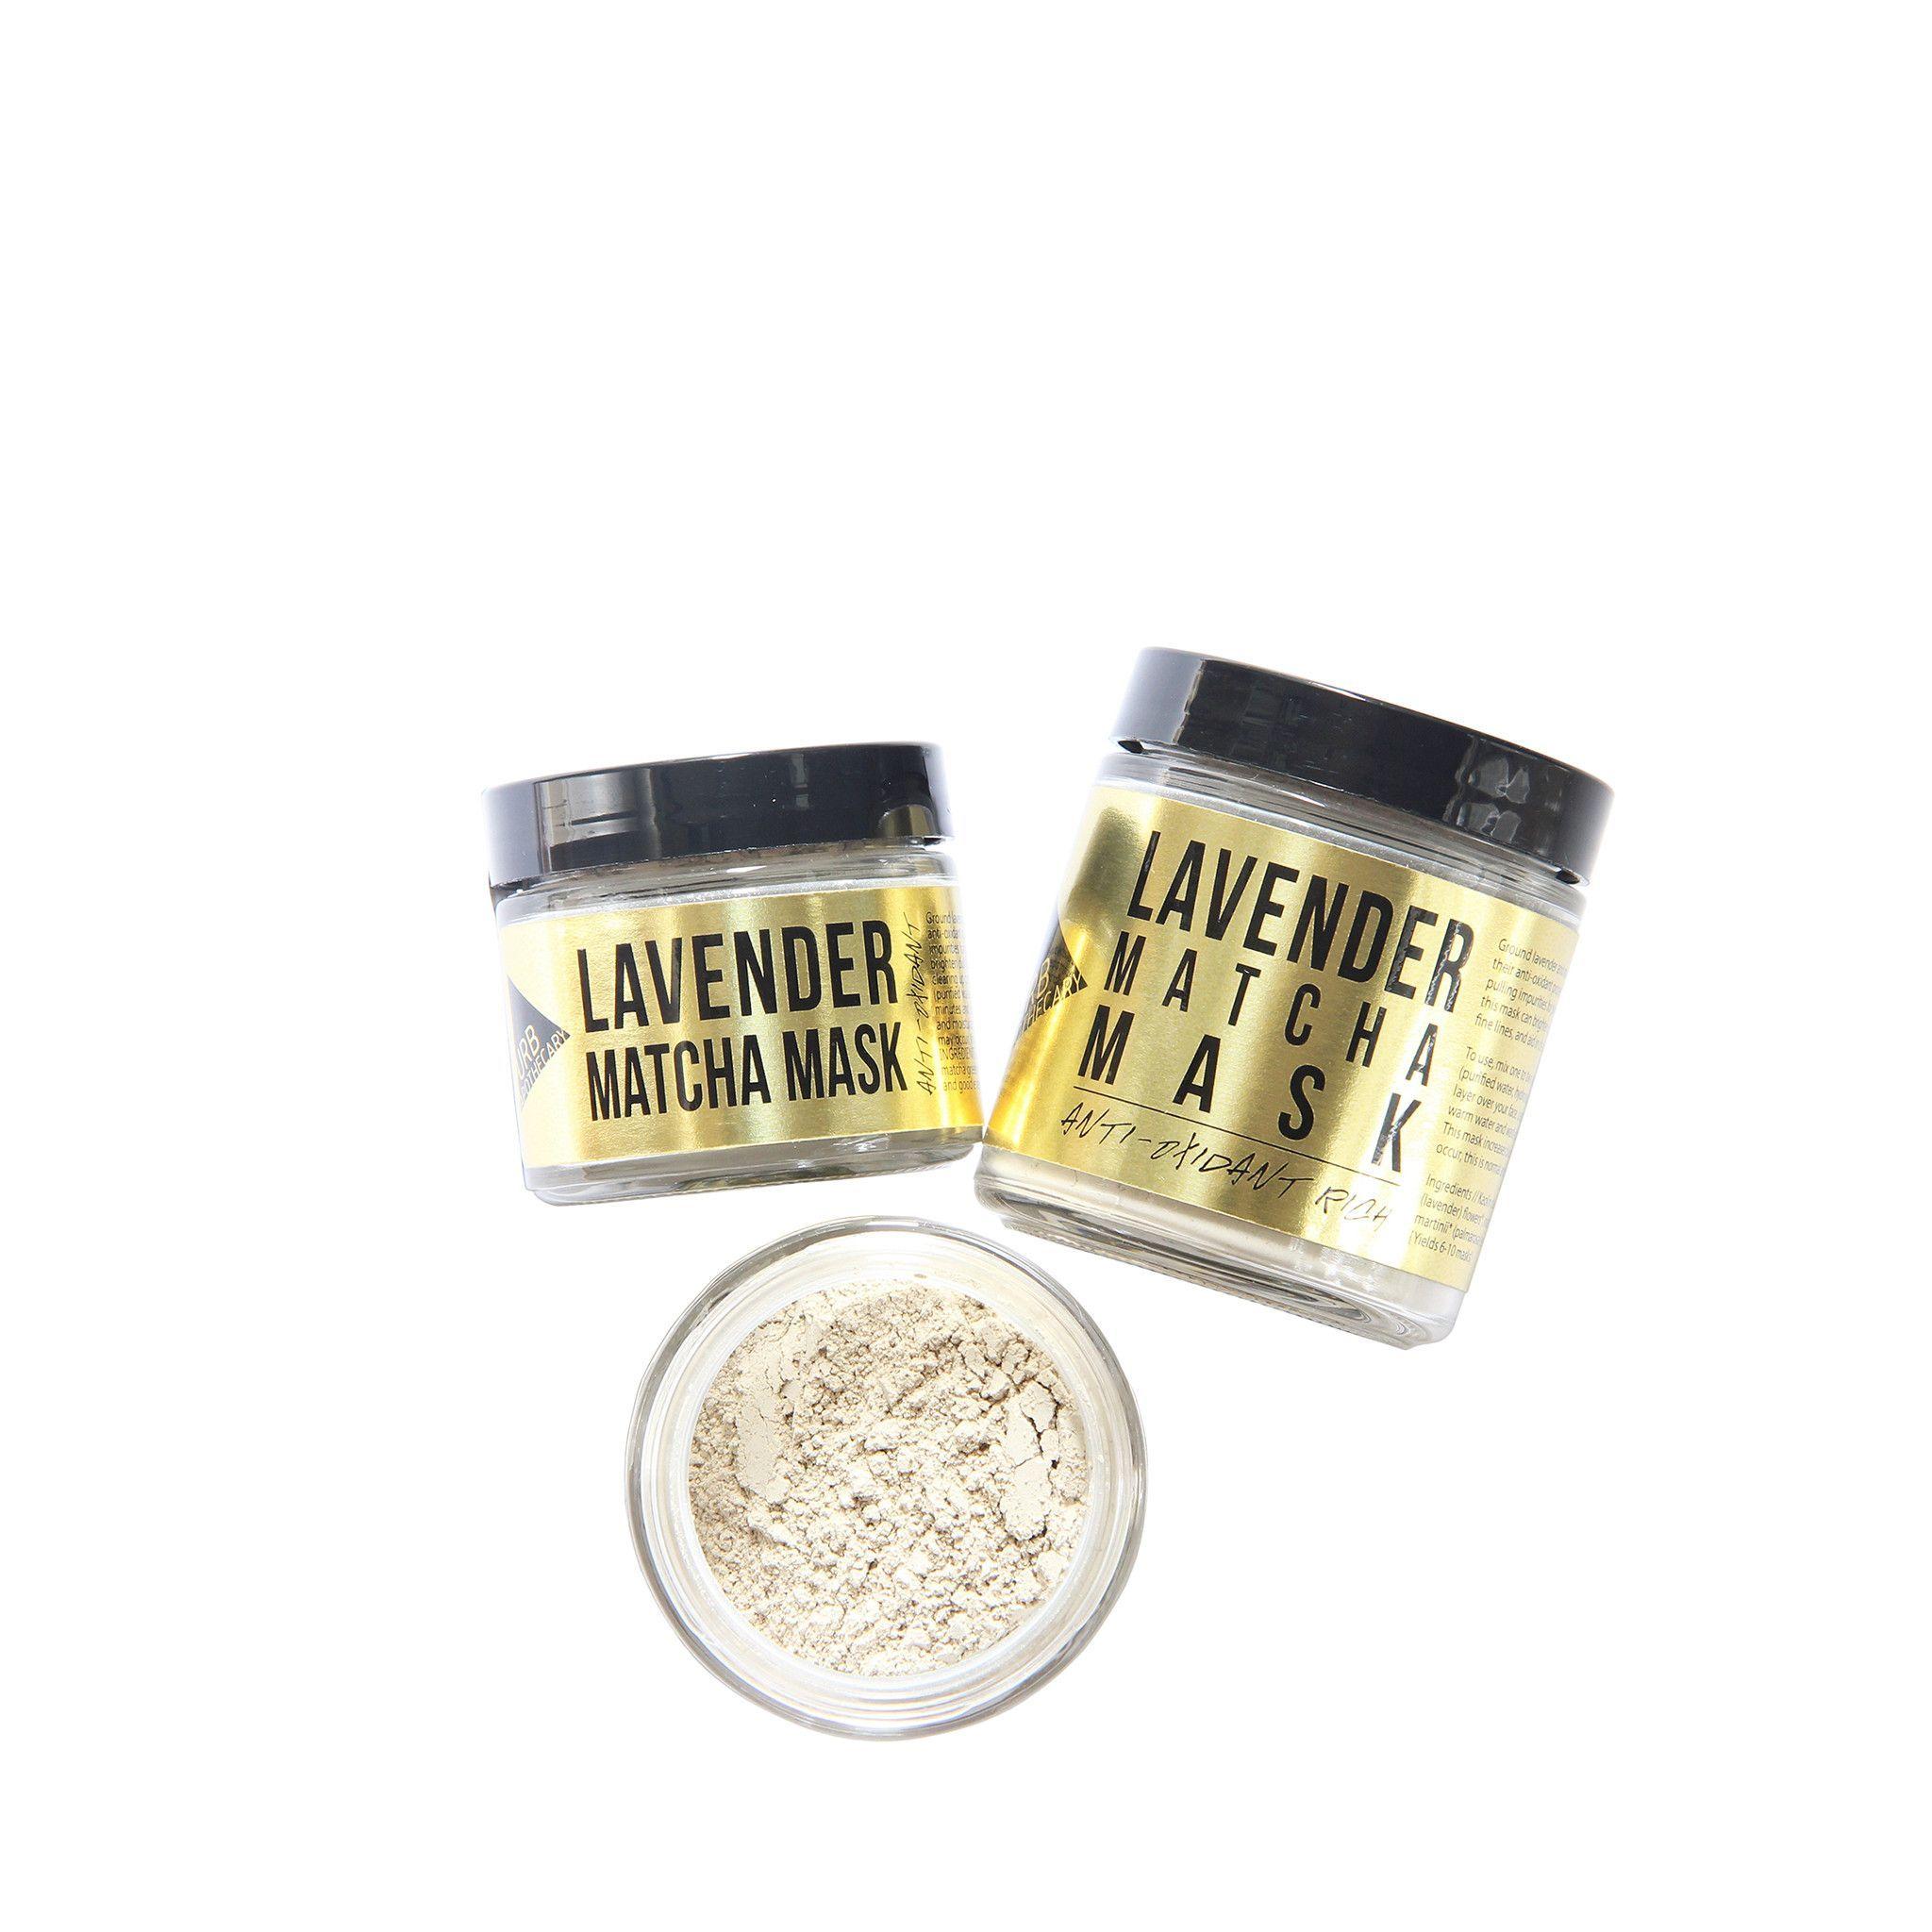 Lavender Matcha Mask